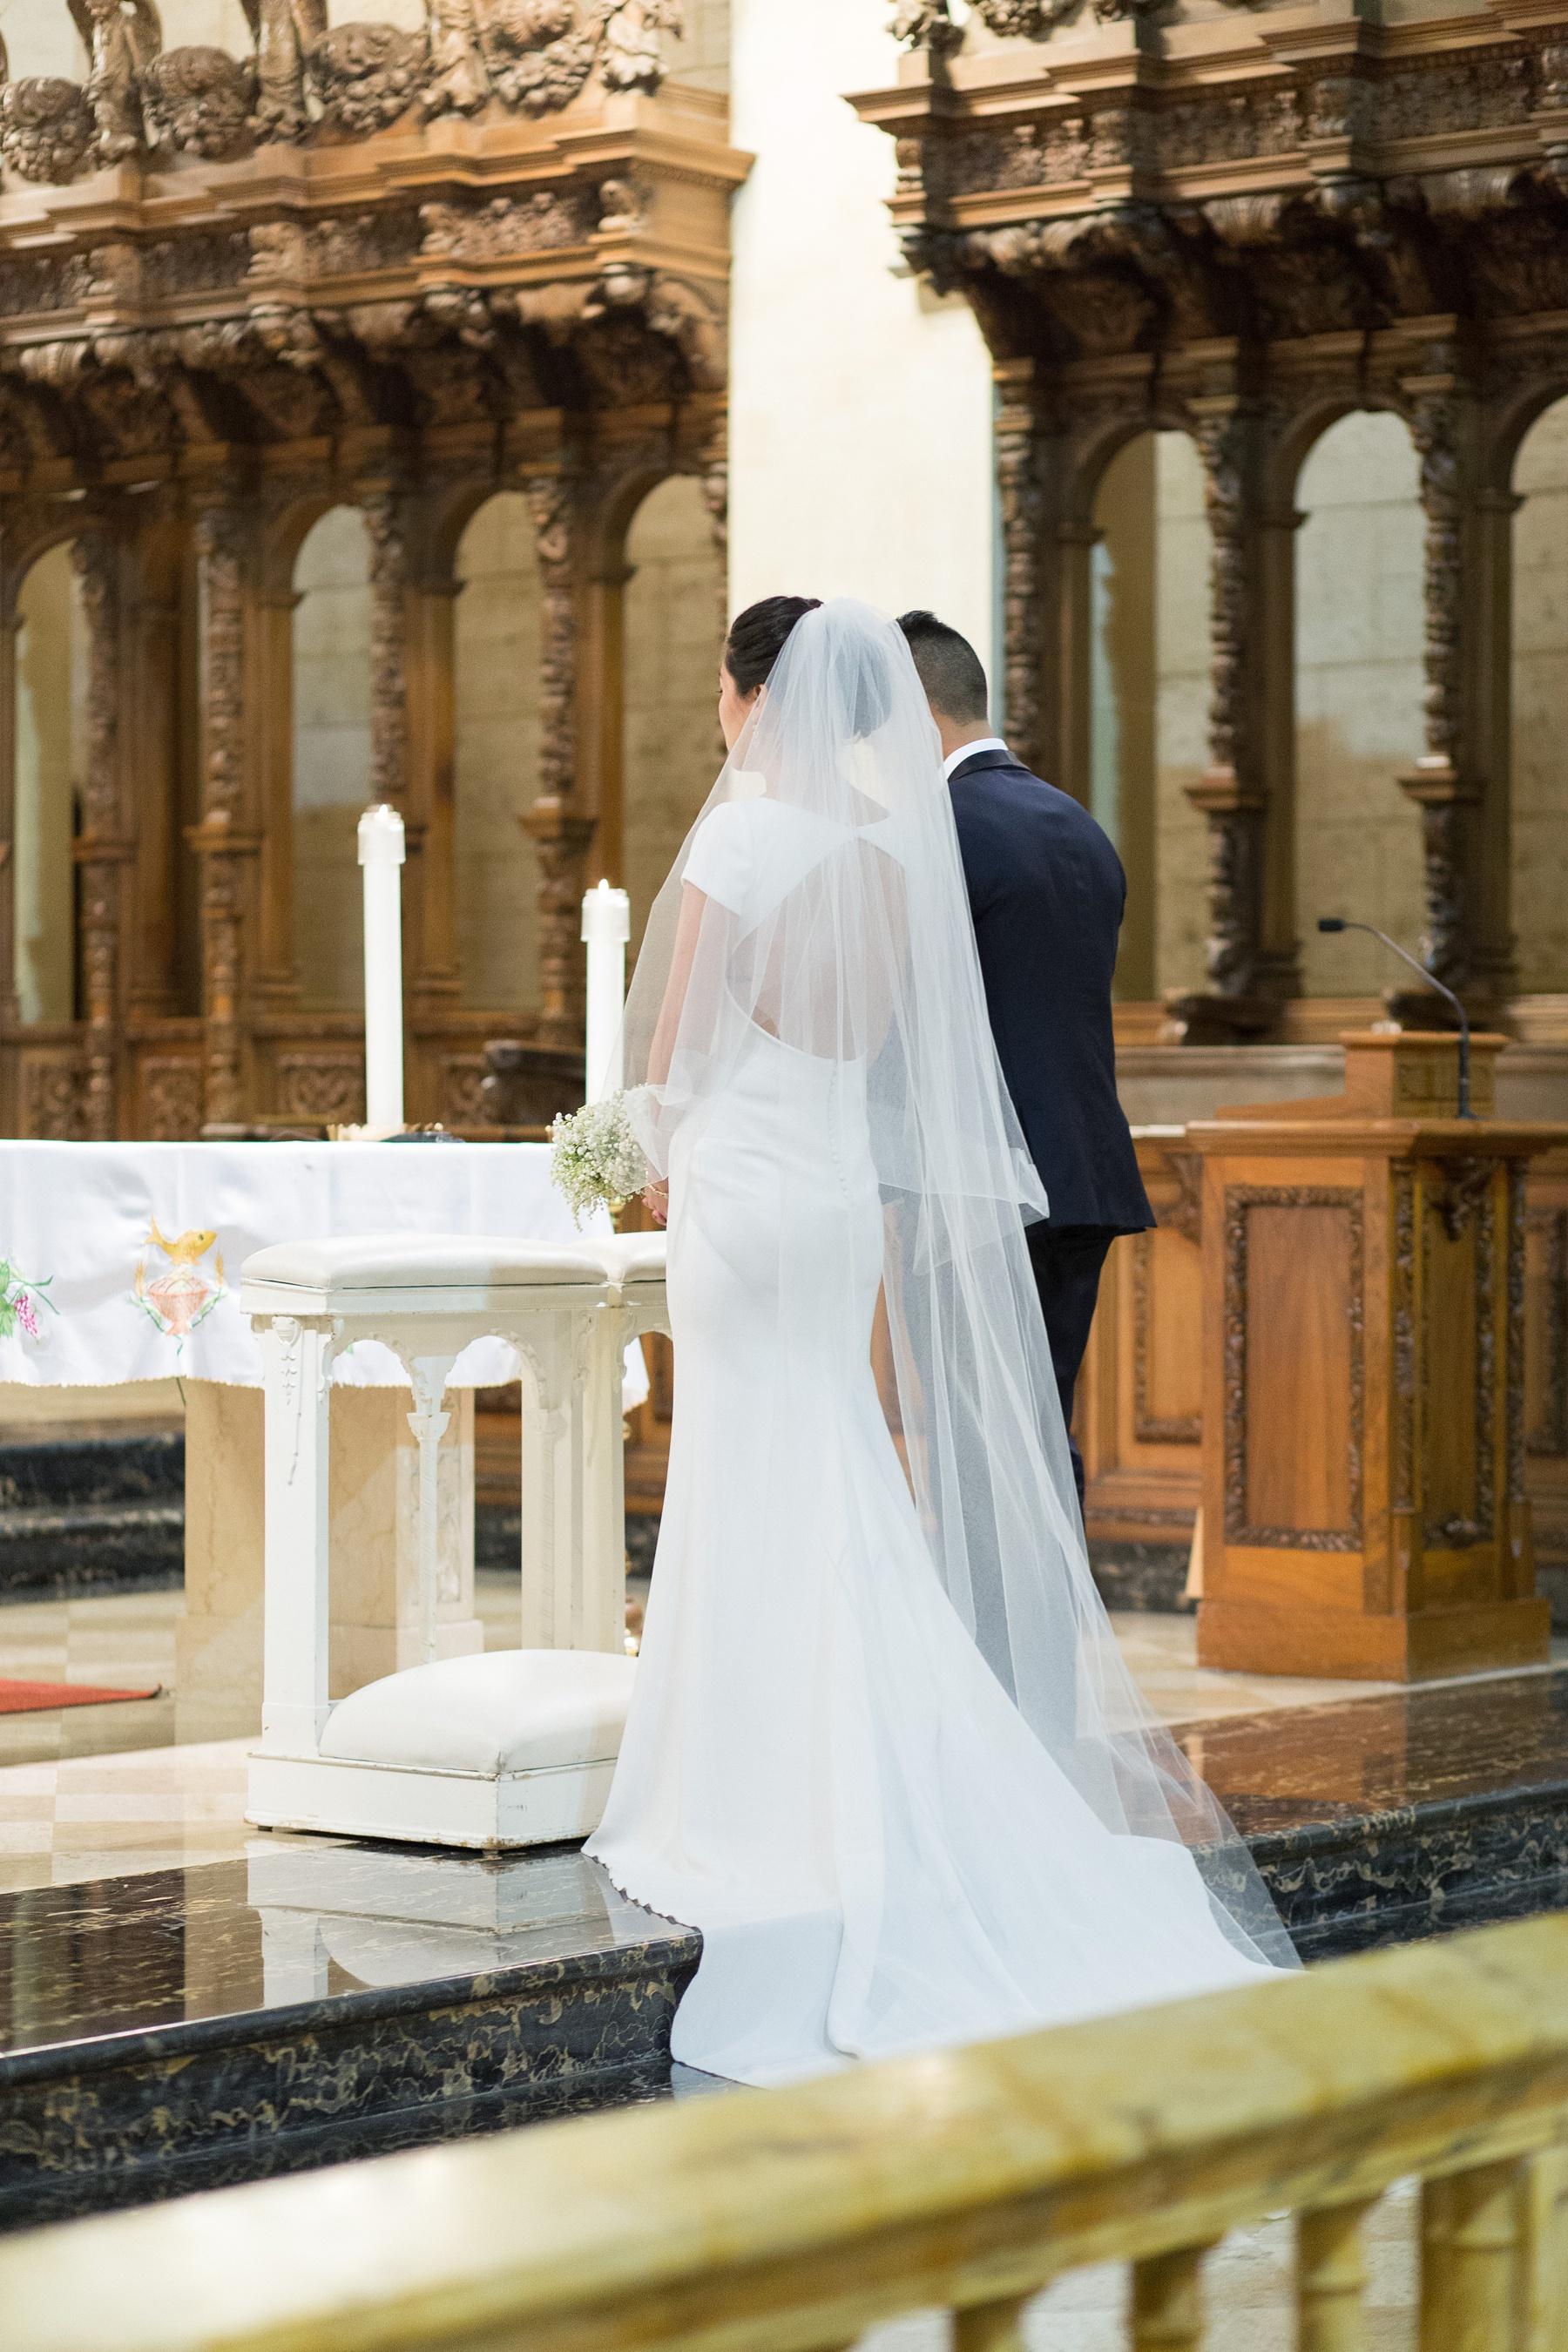 Urban DTLA Wedding at Millwick By Wedding Photographer Madison Ellis (79)